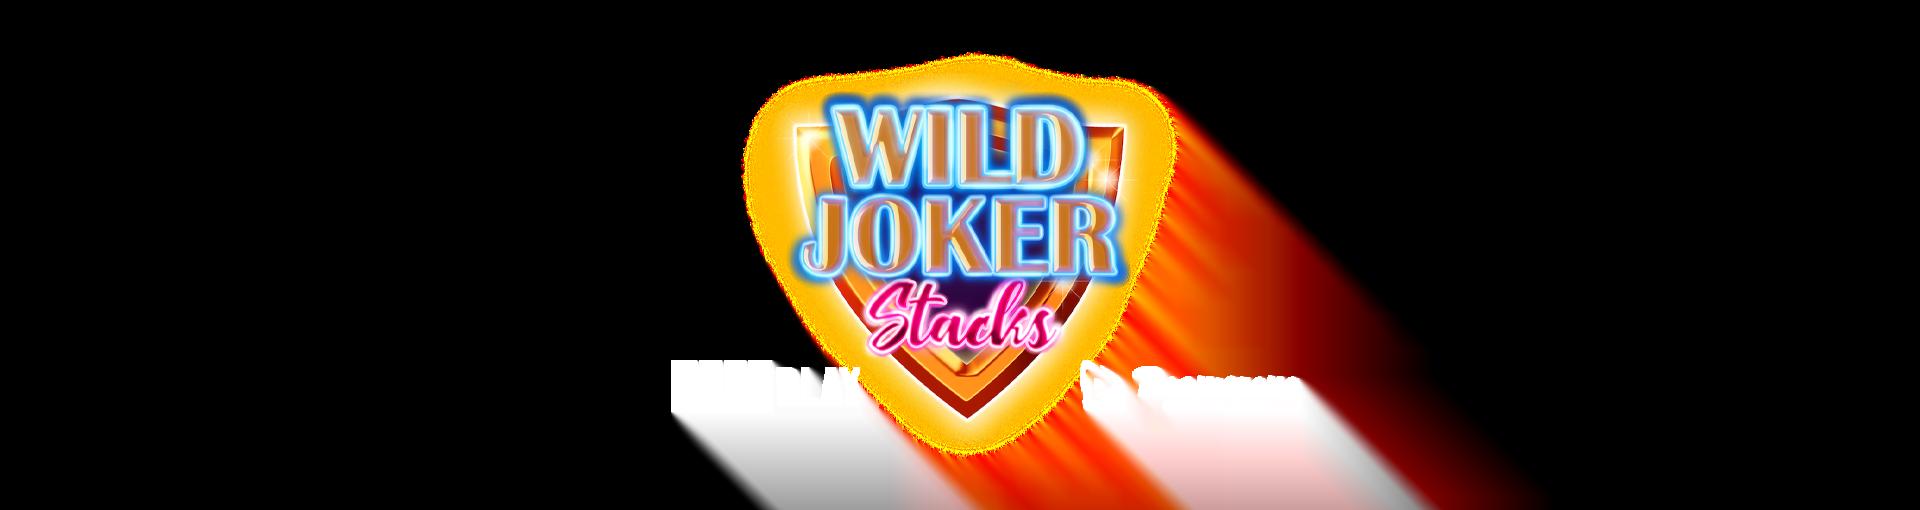 wild_joker_stacks_Yggdrasil-UpcomingGame-Logo-Template-1920x510px